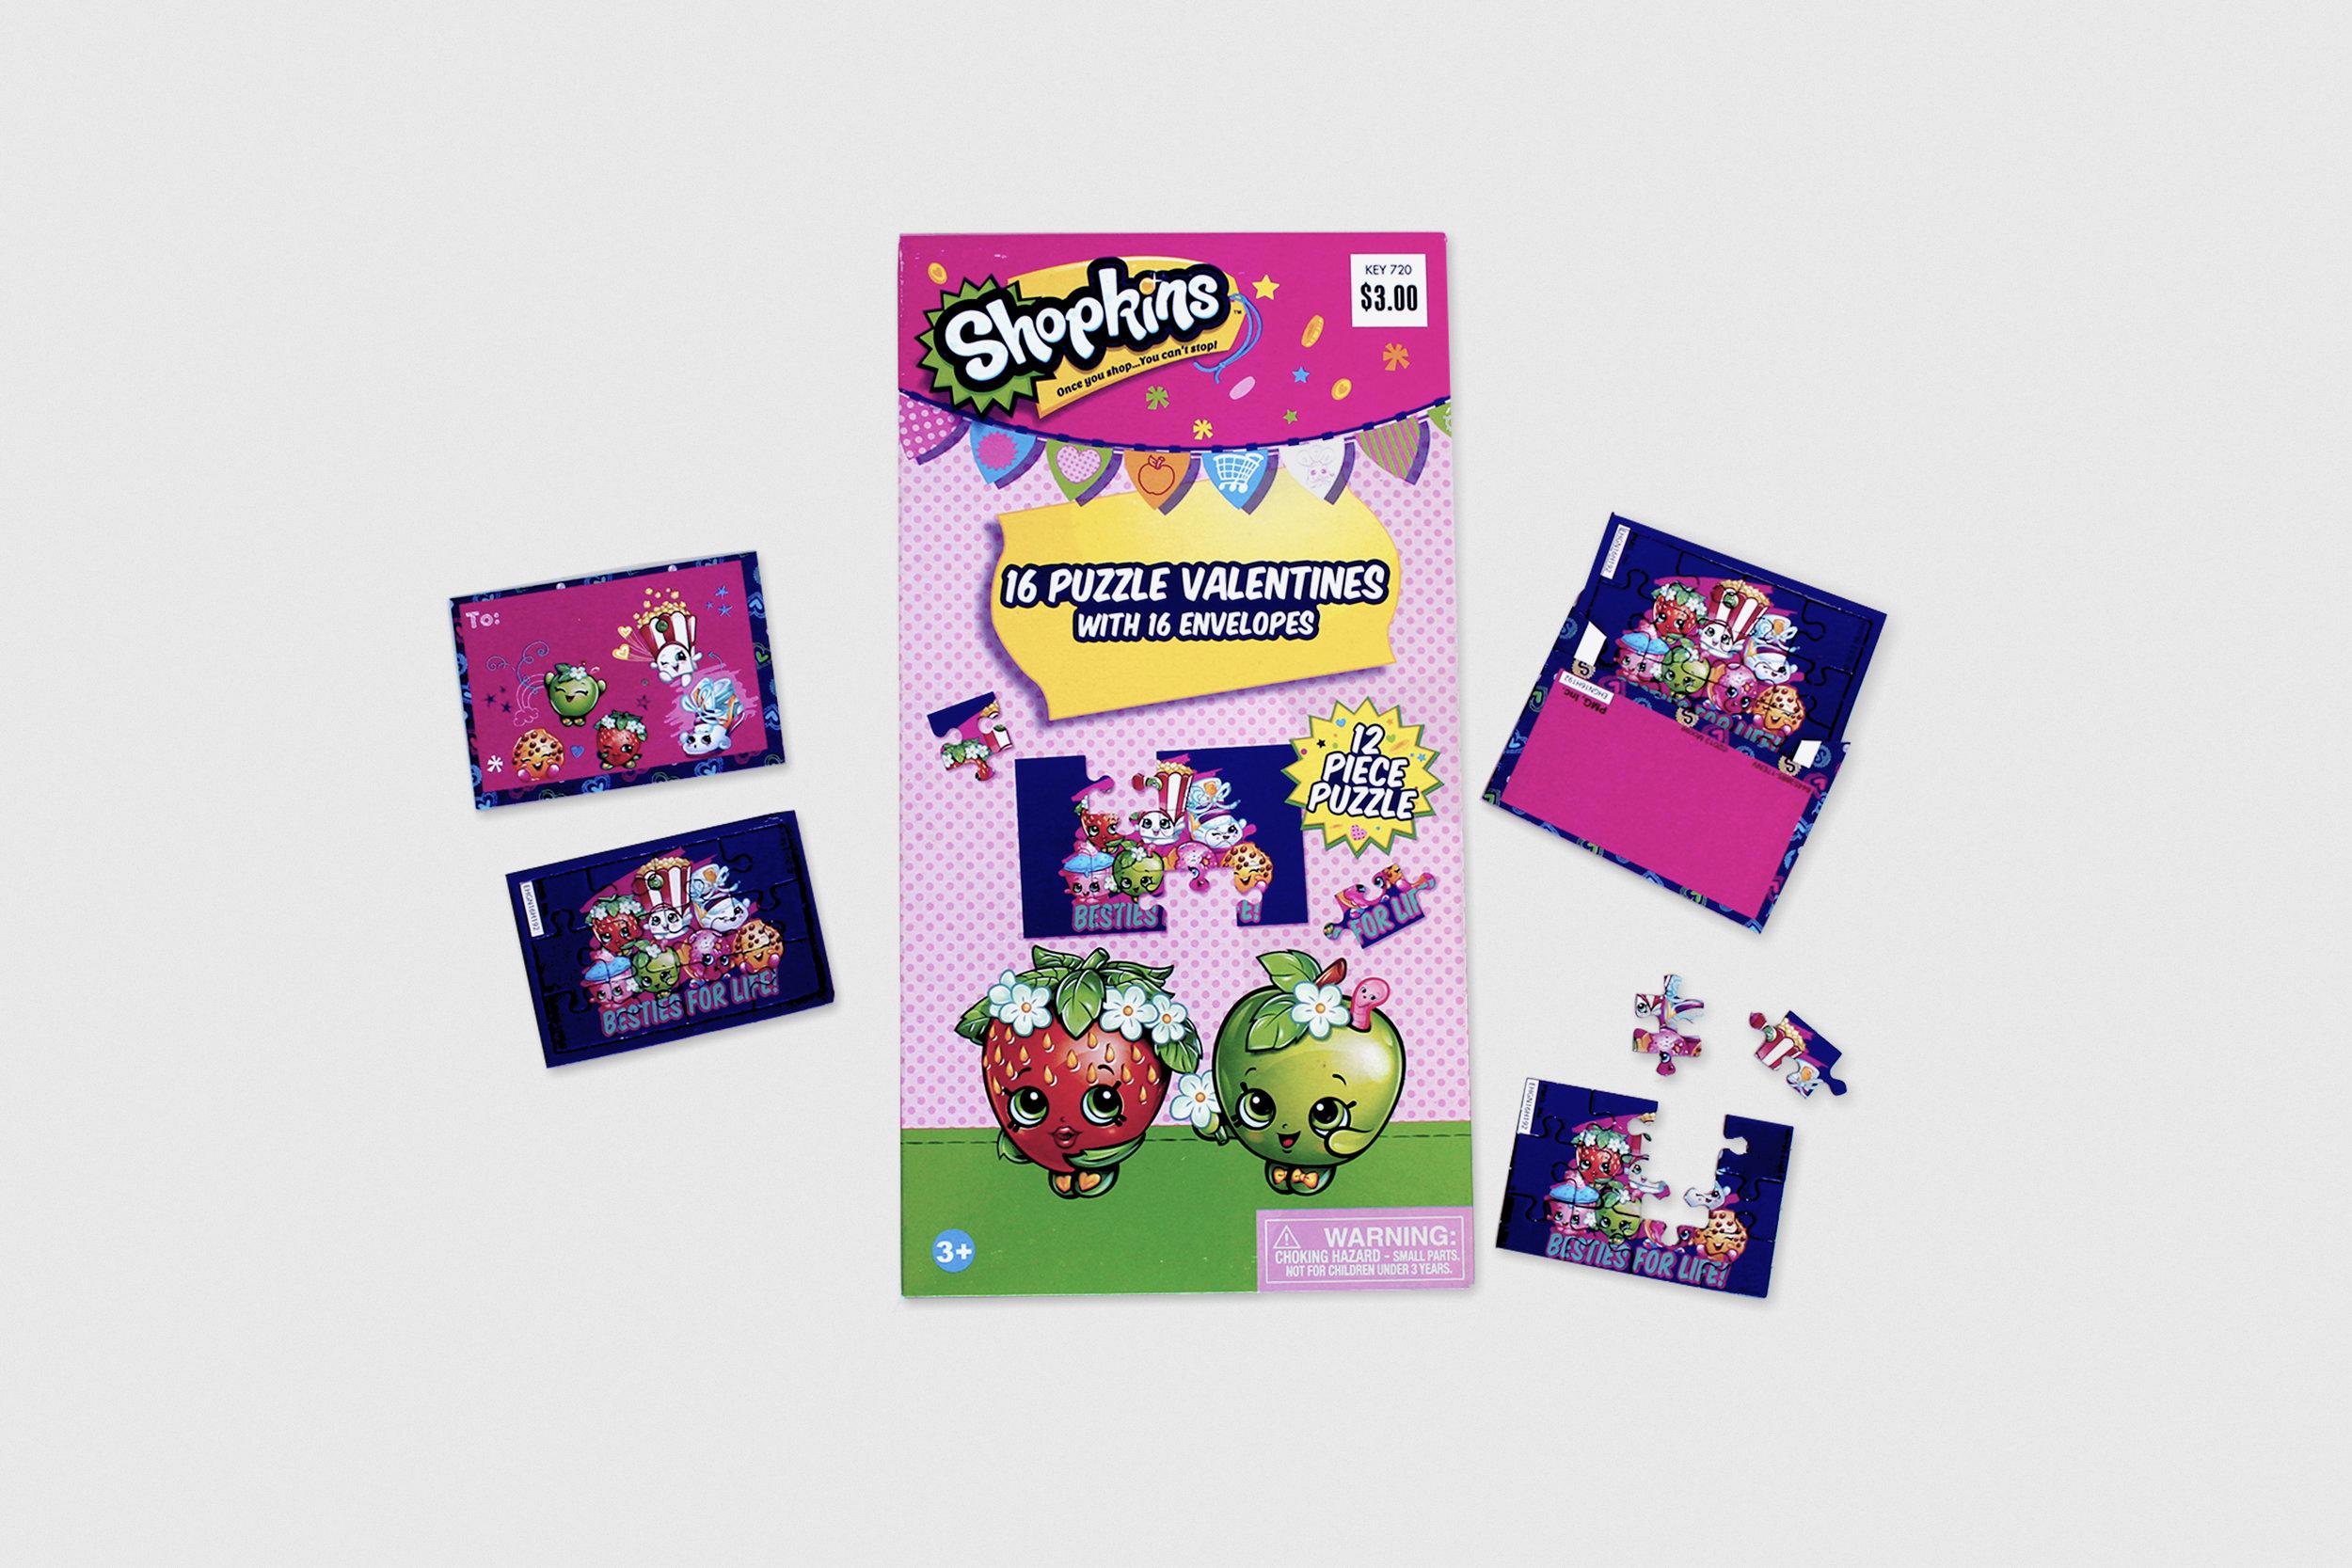 Shopkins-vday-puzzles.jpg